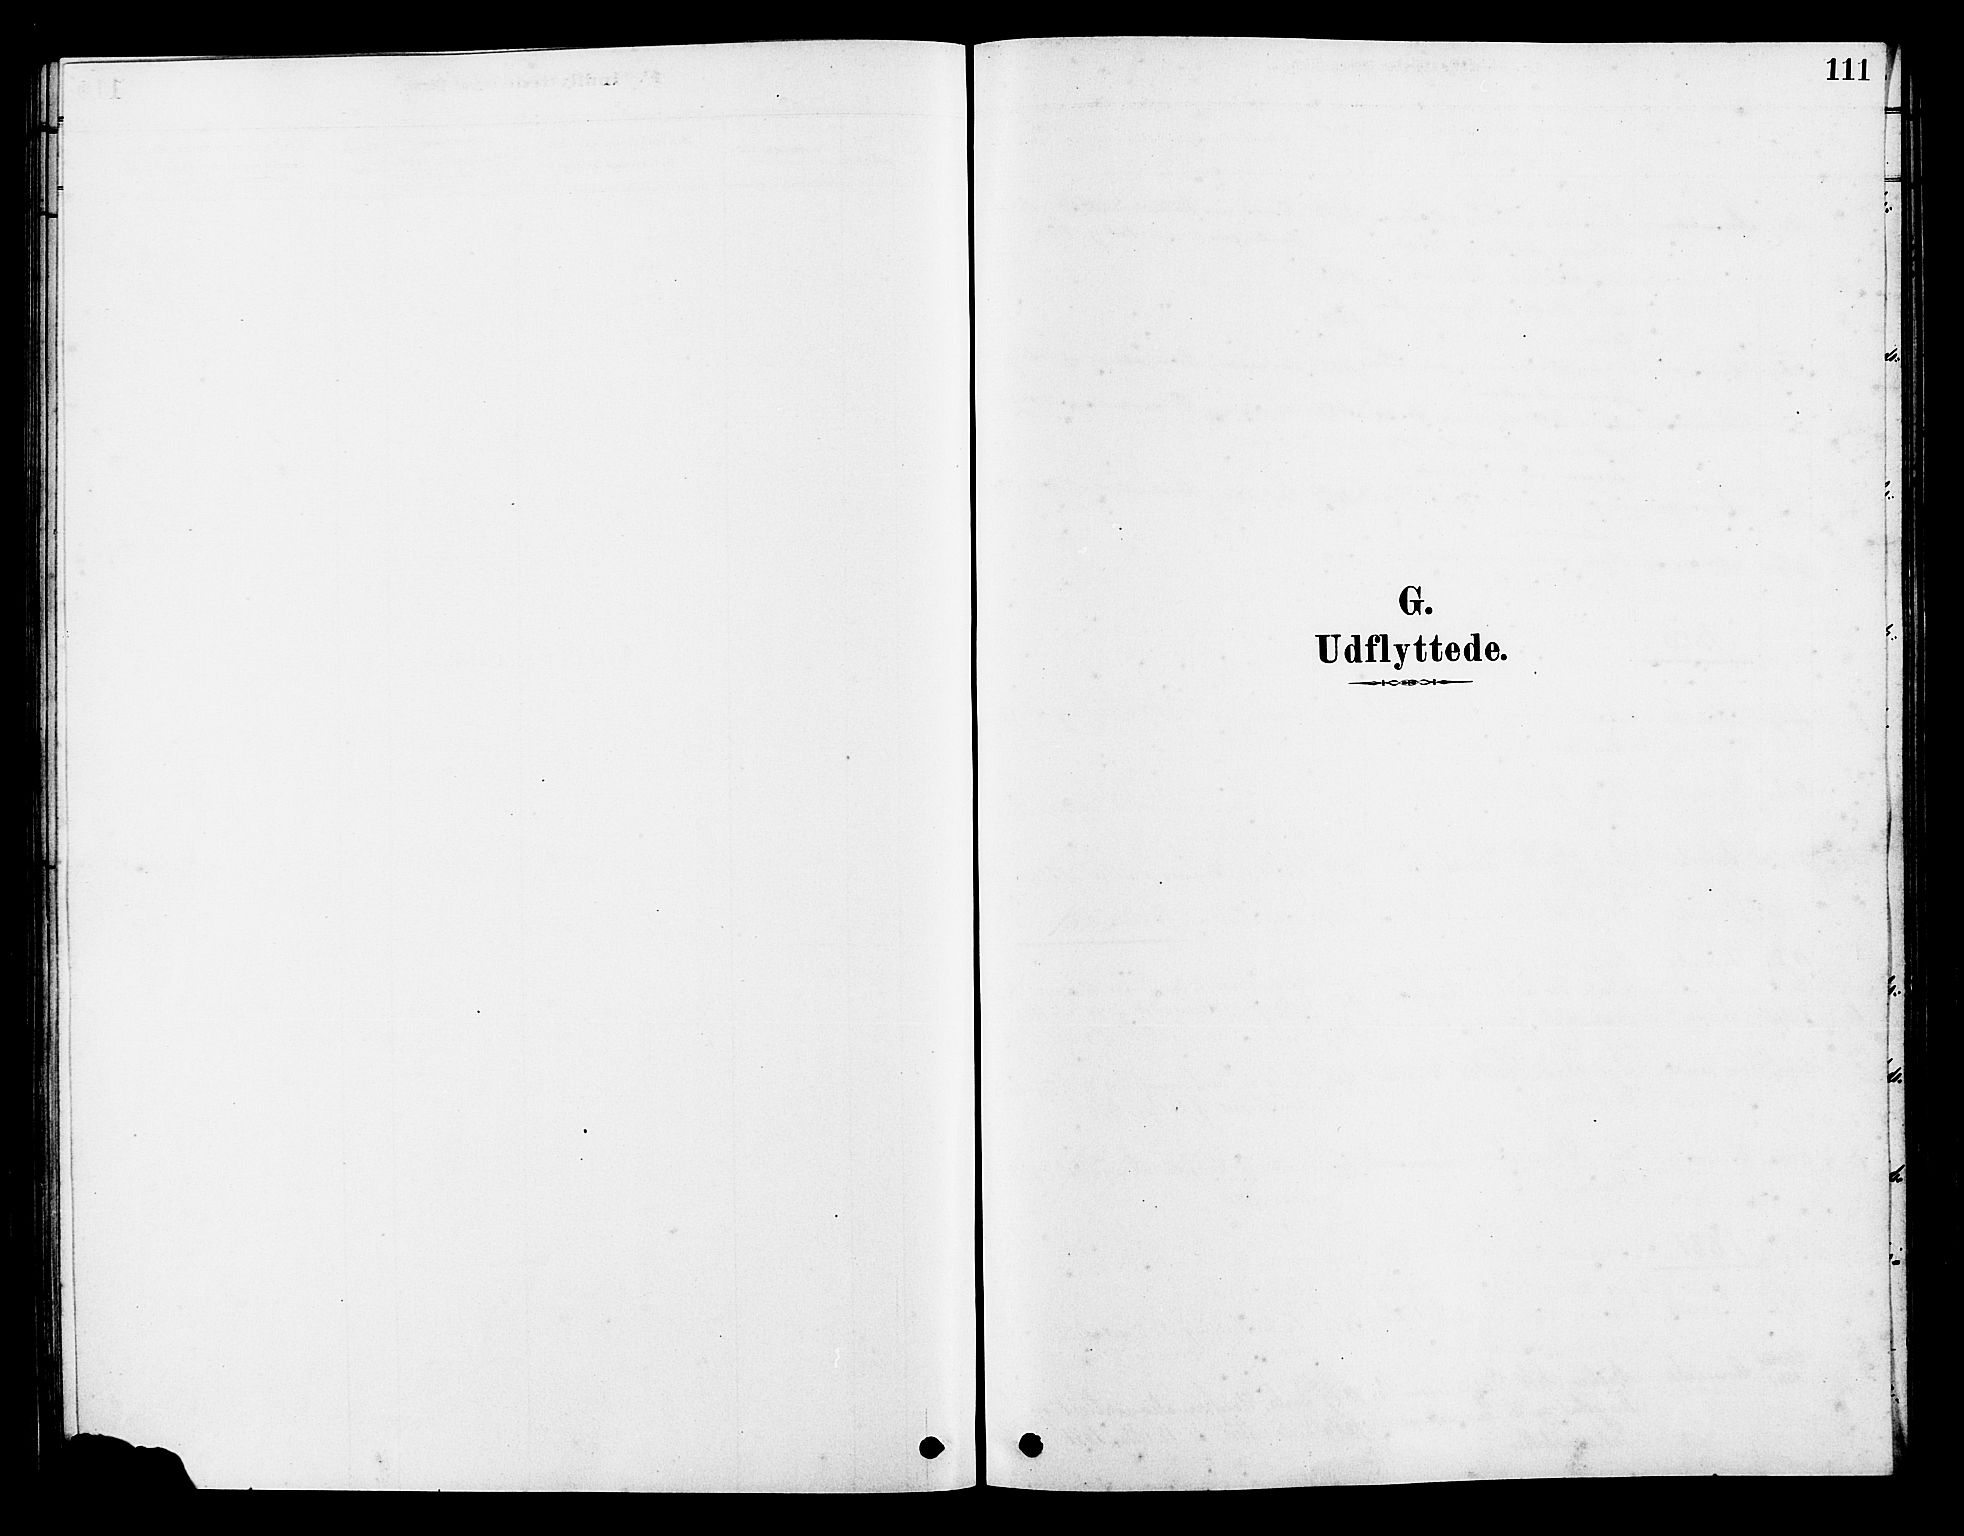 SAST, Torvastad sokneprestkontor, H/Ha/Haa/L0014: Ministerialbok nr. A 13, 1879-1888, s. 111